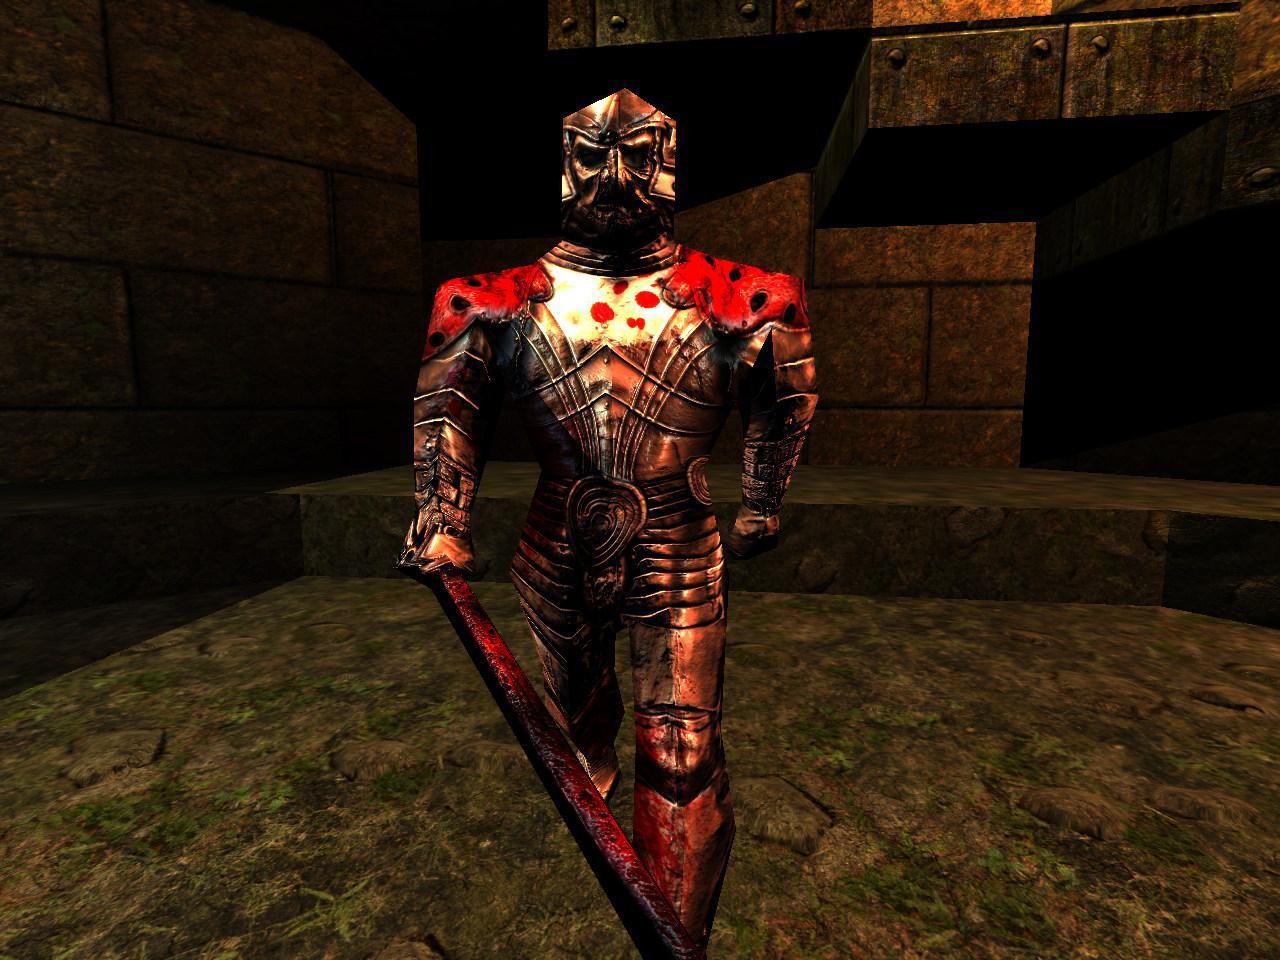 Quake Reforged - Bestiary - Quake - The Knight